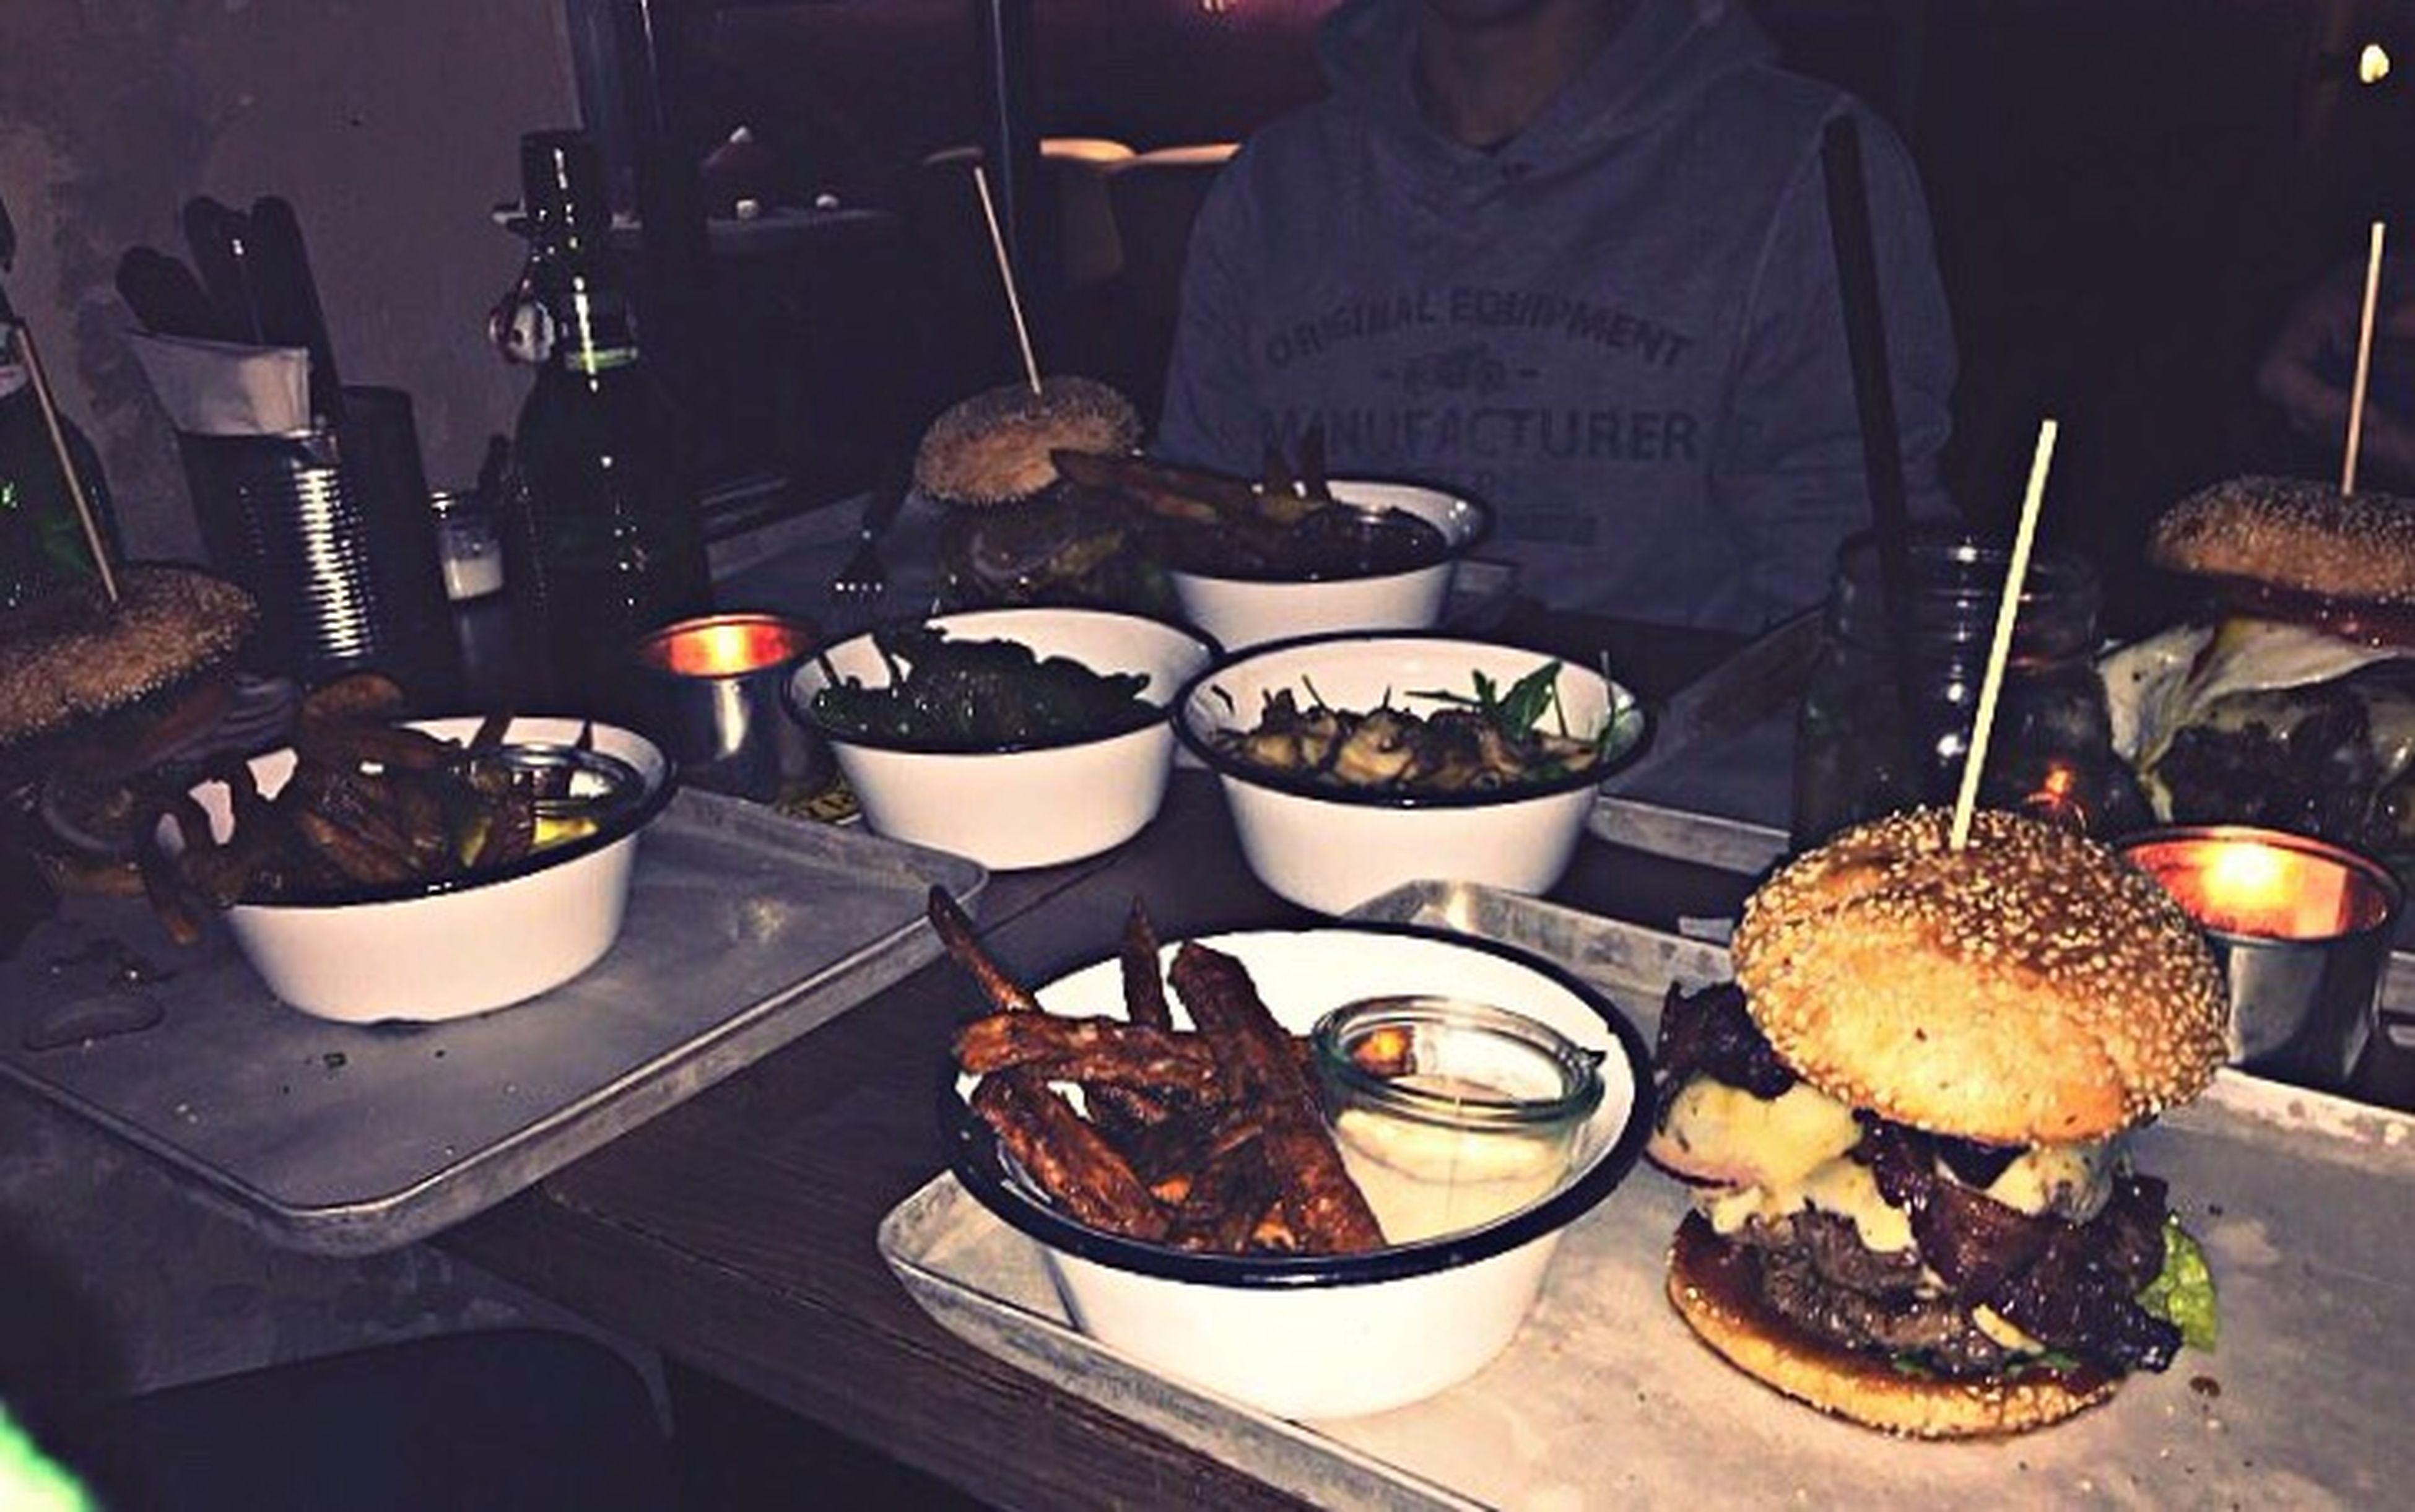 essenfassen... Eat Burger Boooyaah! Friends Dinner Dinner Time Food Foodphotography Frieswithdip DIP Lalalima-primaklima Jalapeños